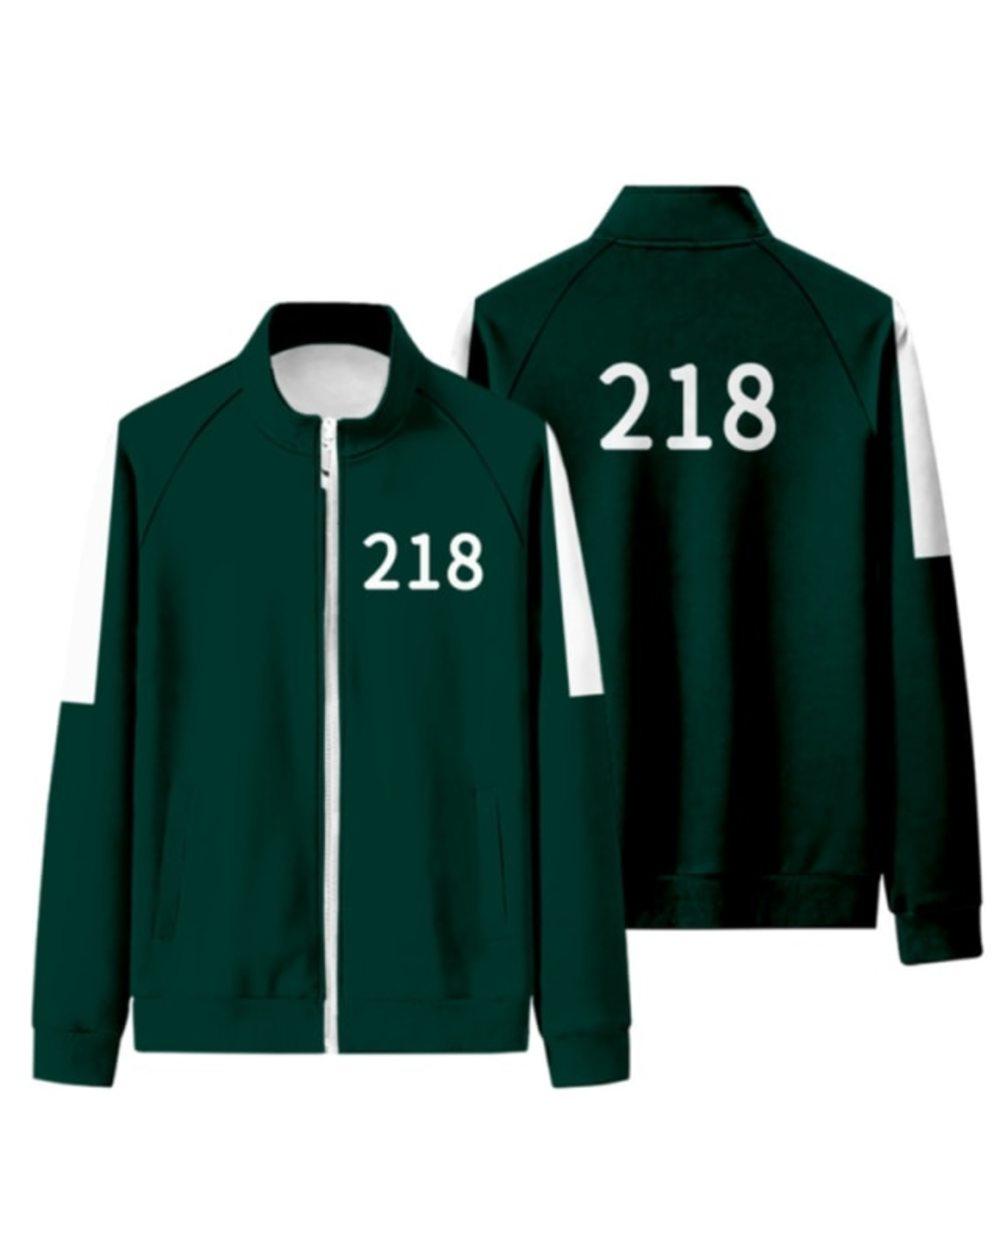 Squid Game Sportswear Cosplay Zip Hoodie Squid Game Tracksuit Green Track Jacket and Track Pants